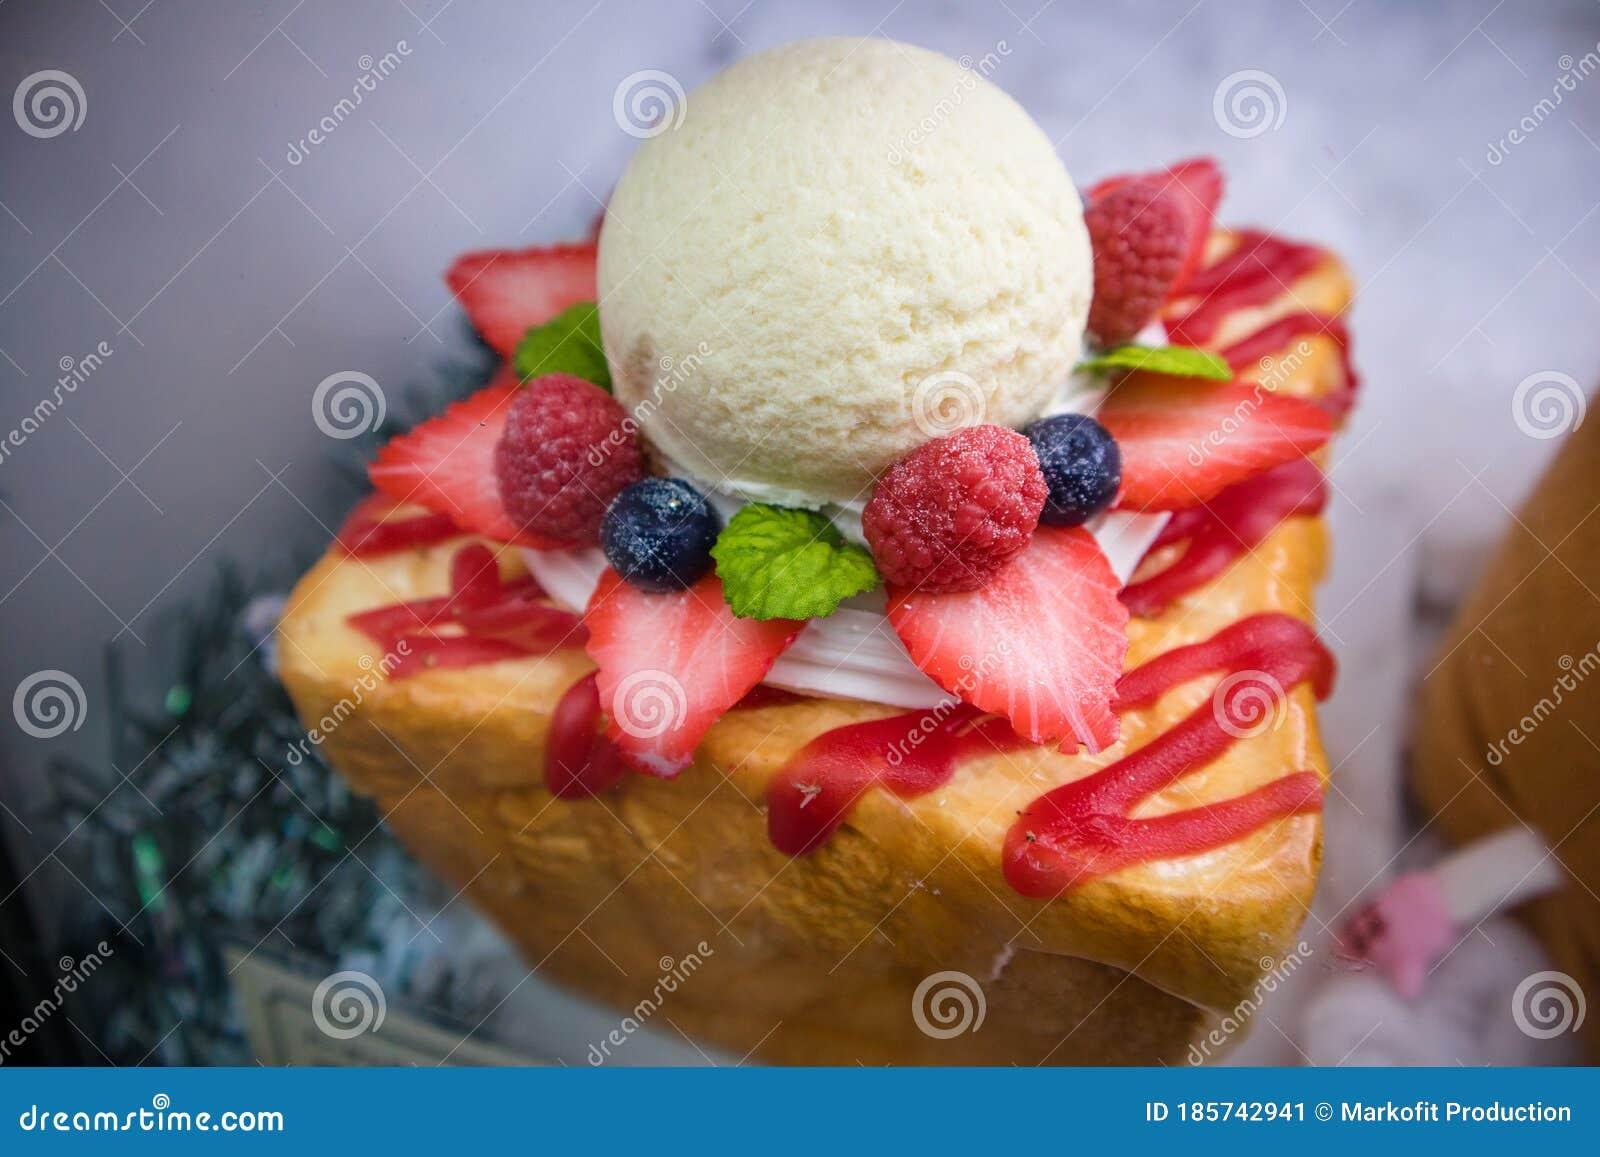 Japanese Ice Cream Bread As Street Food In Osaka Stock Image Image Of Dish Health 185742941